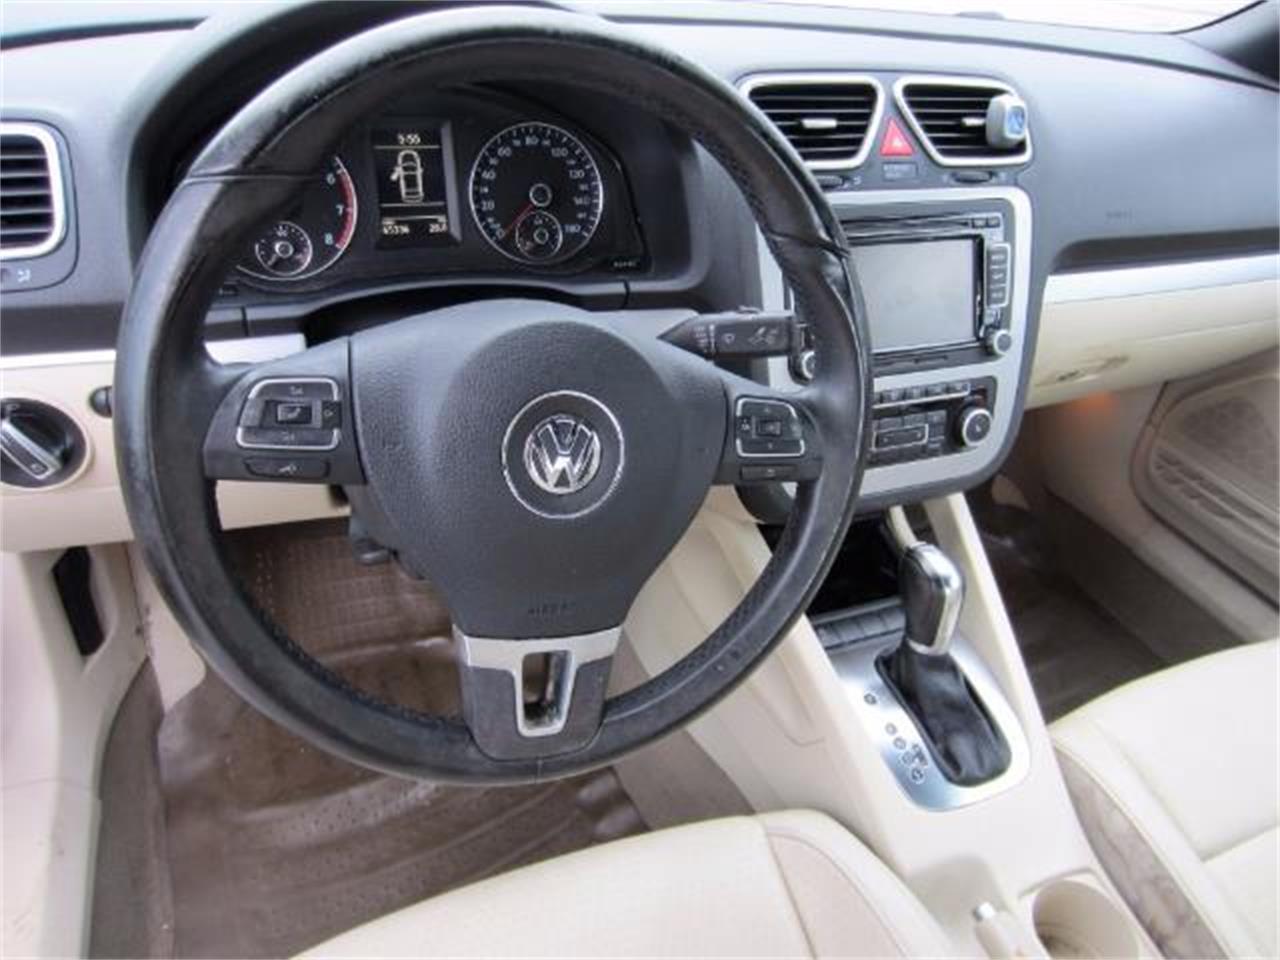 Large Picture of 2012 Volkswagen EosKomfort SULEV located in Florida - $12,900.00 - L1LI